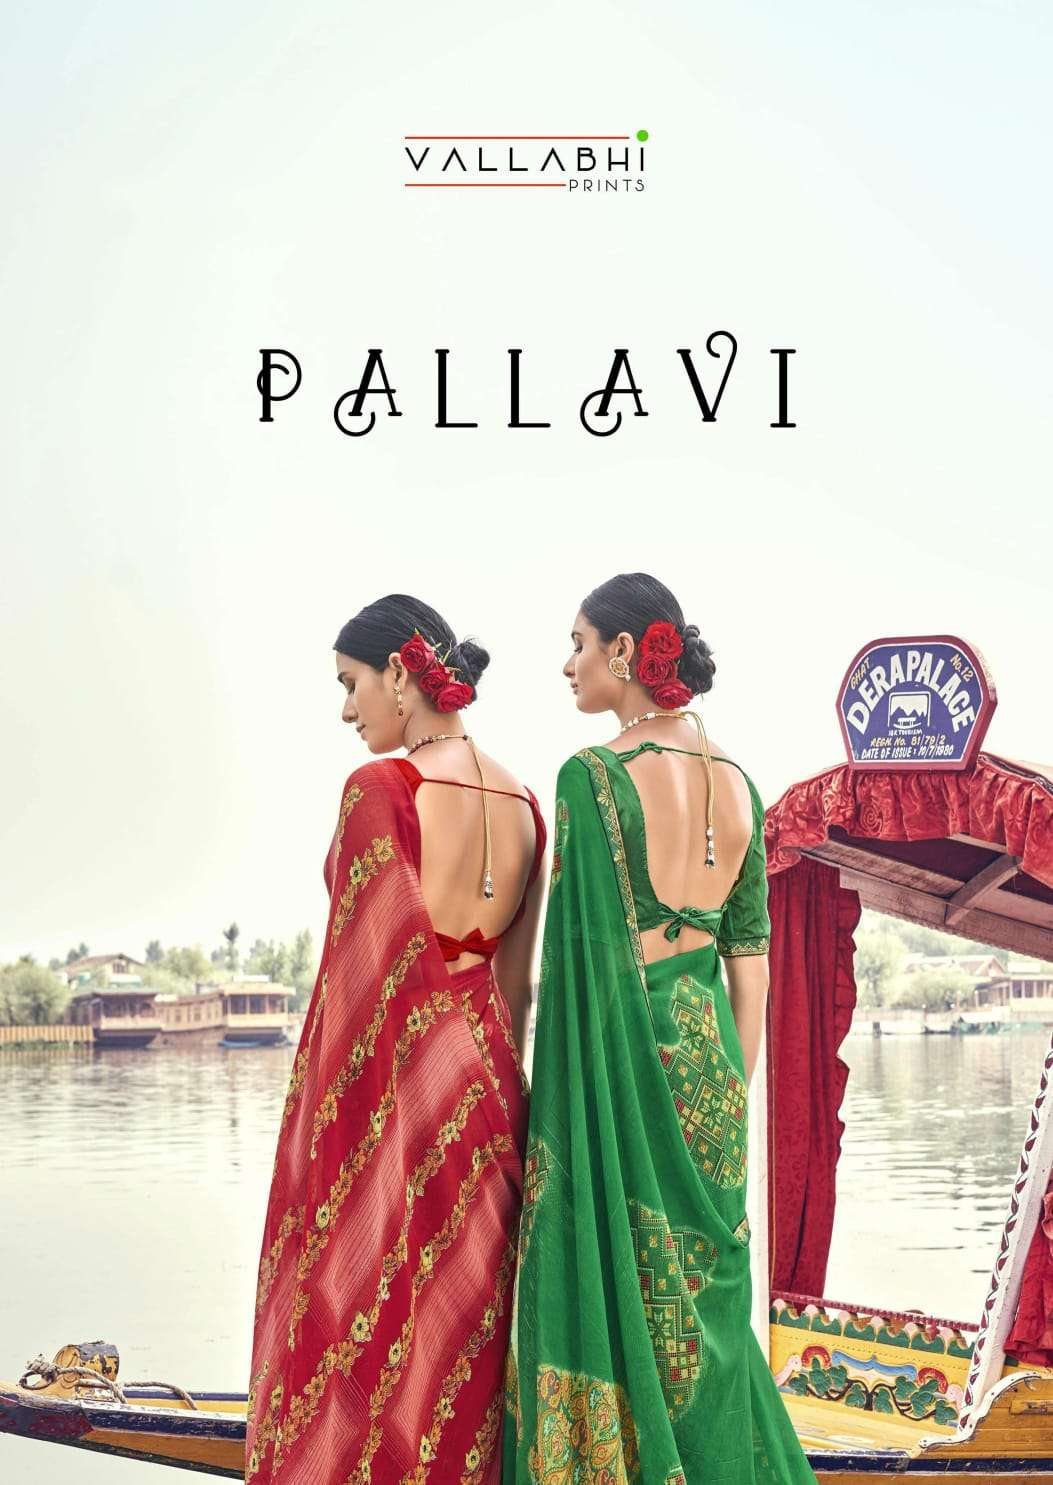 vallabhi Prints pallavi Chiffon Printed Saree New Designs